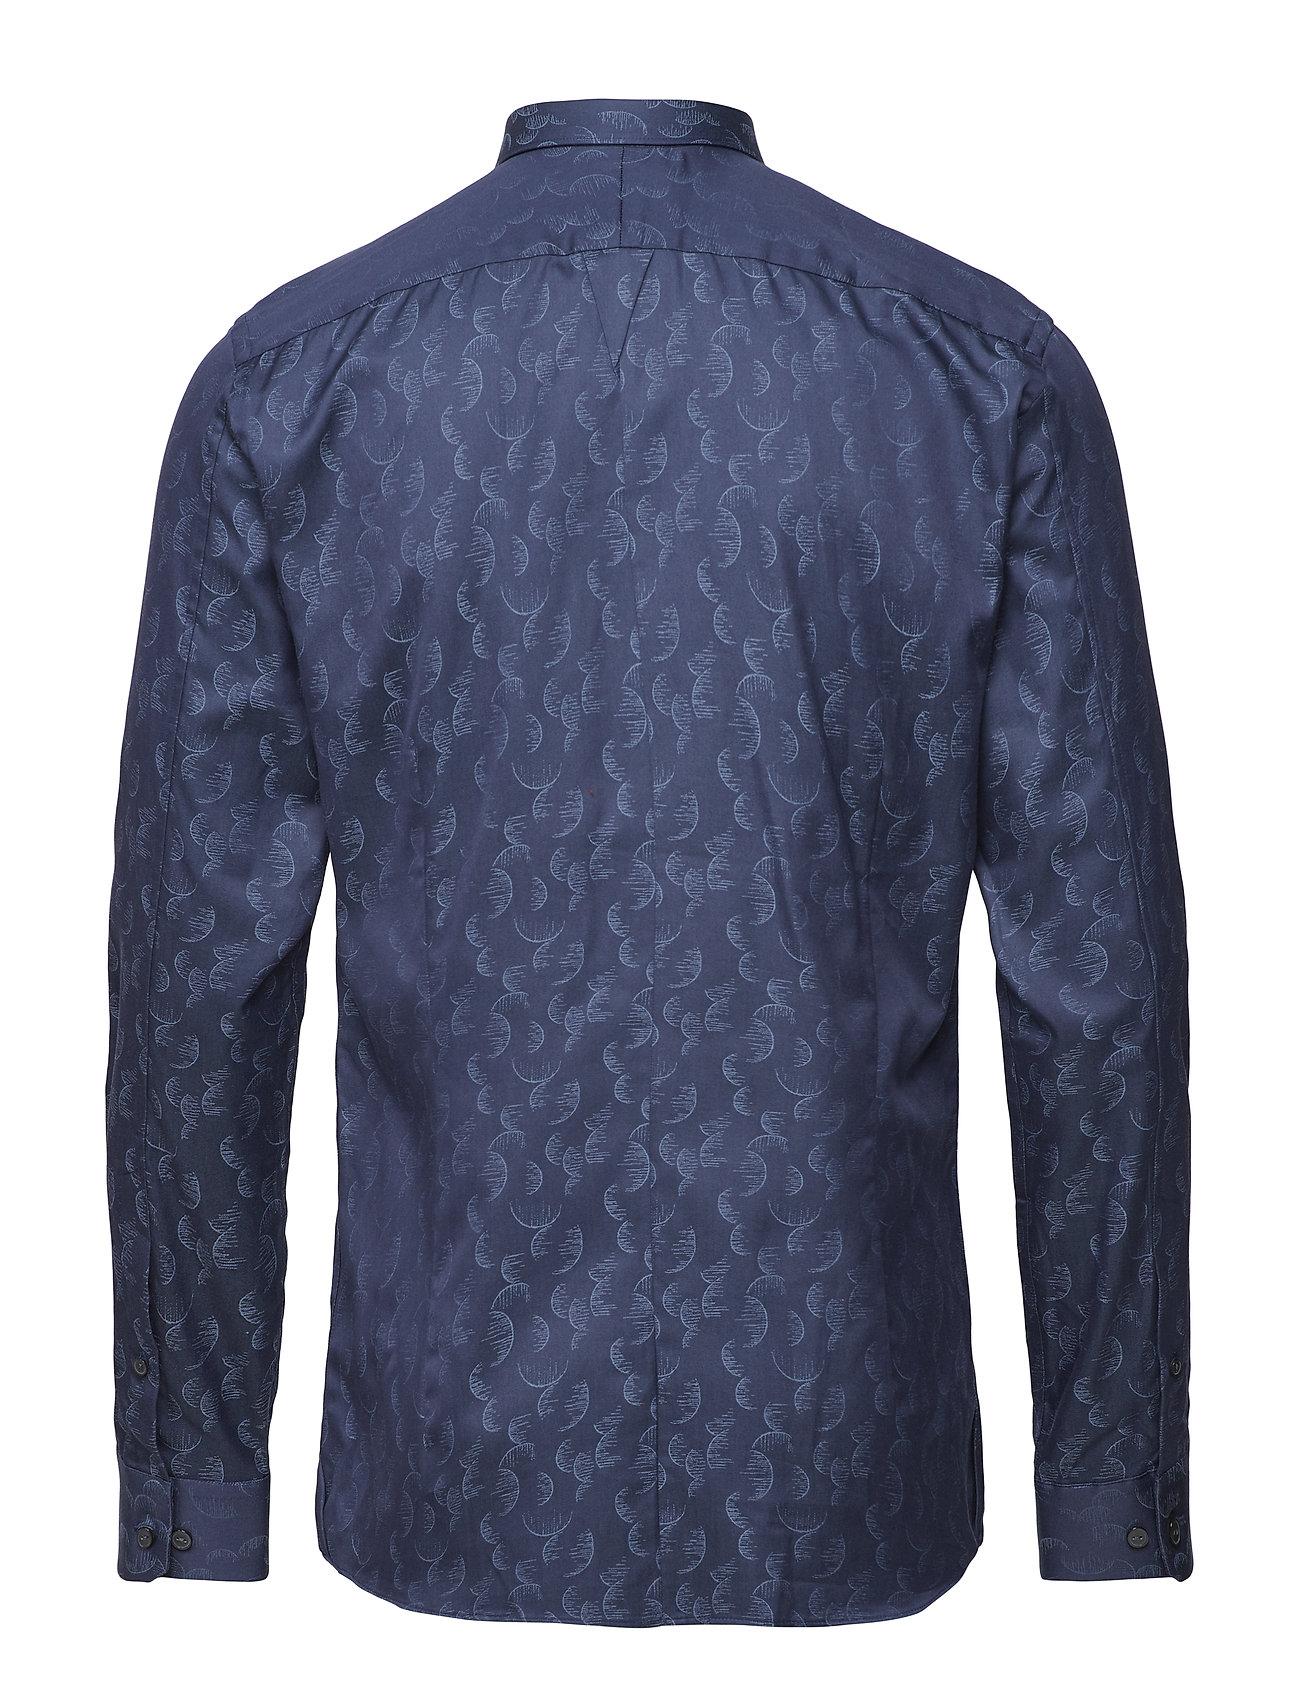 Jacquard Luxe s BlueJunk Shirtdk Dress L De wvm80nNO